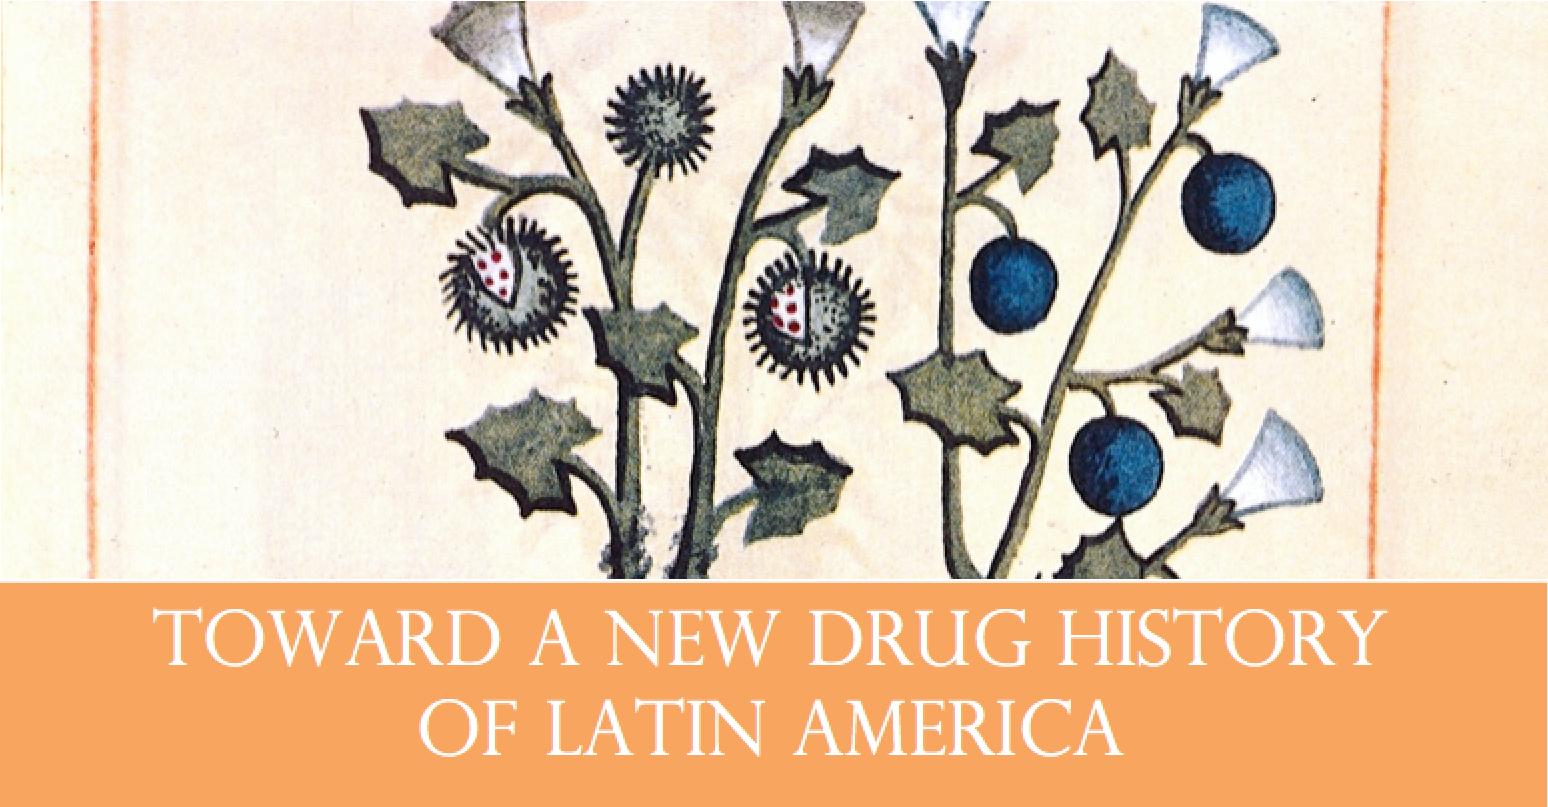 Toward a New Drug History of Latin America